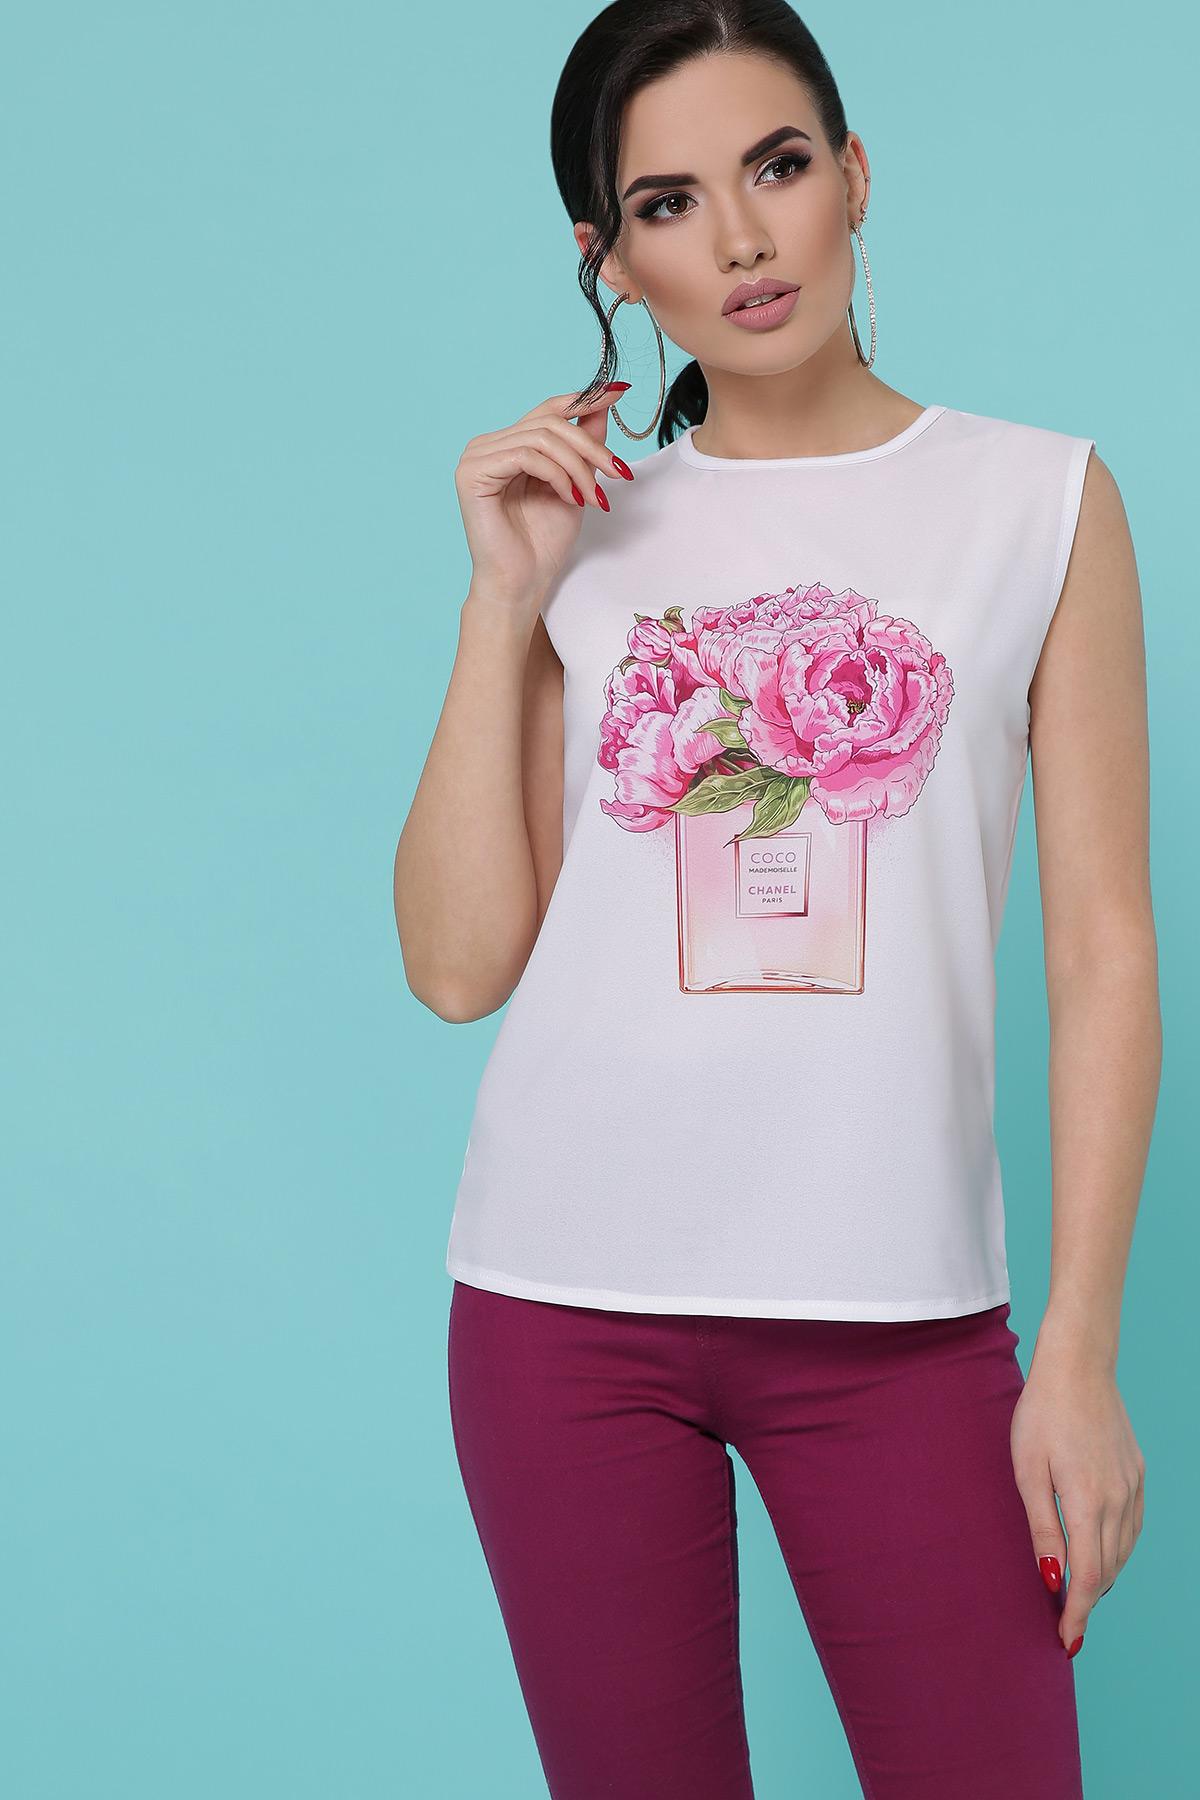 Парфюм Пионы футболка Киви б/р. Цвет: белый